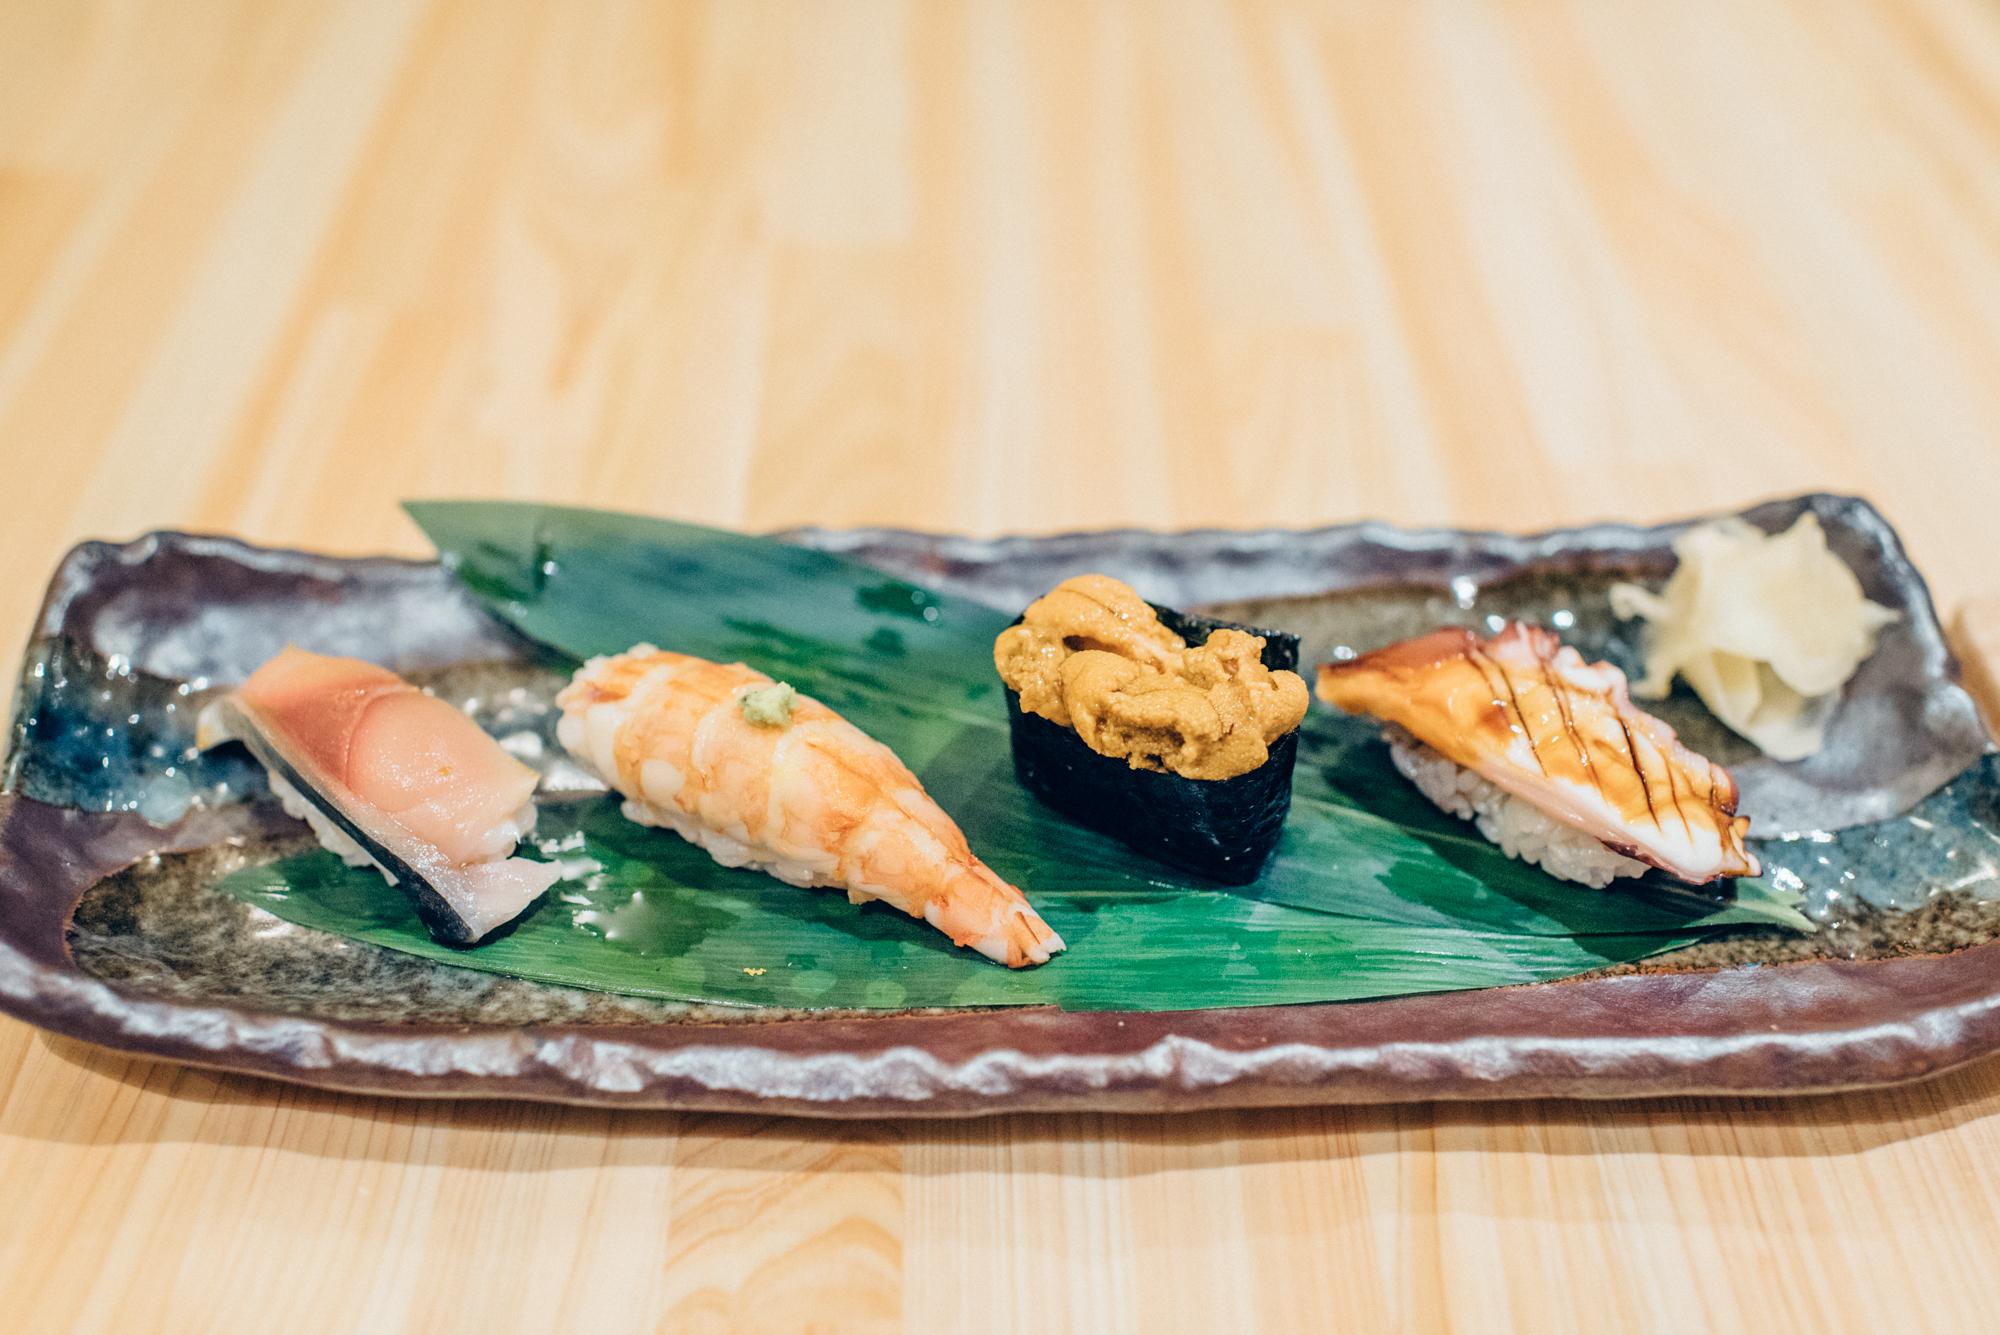 toronto-omakase-sushi-shoushin-18.jpg